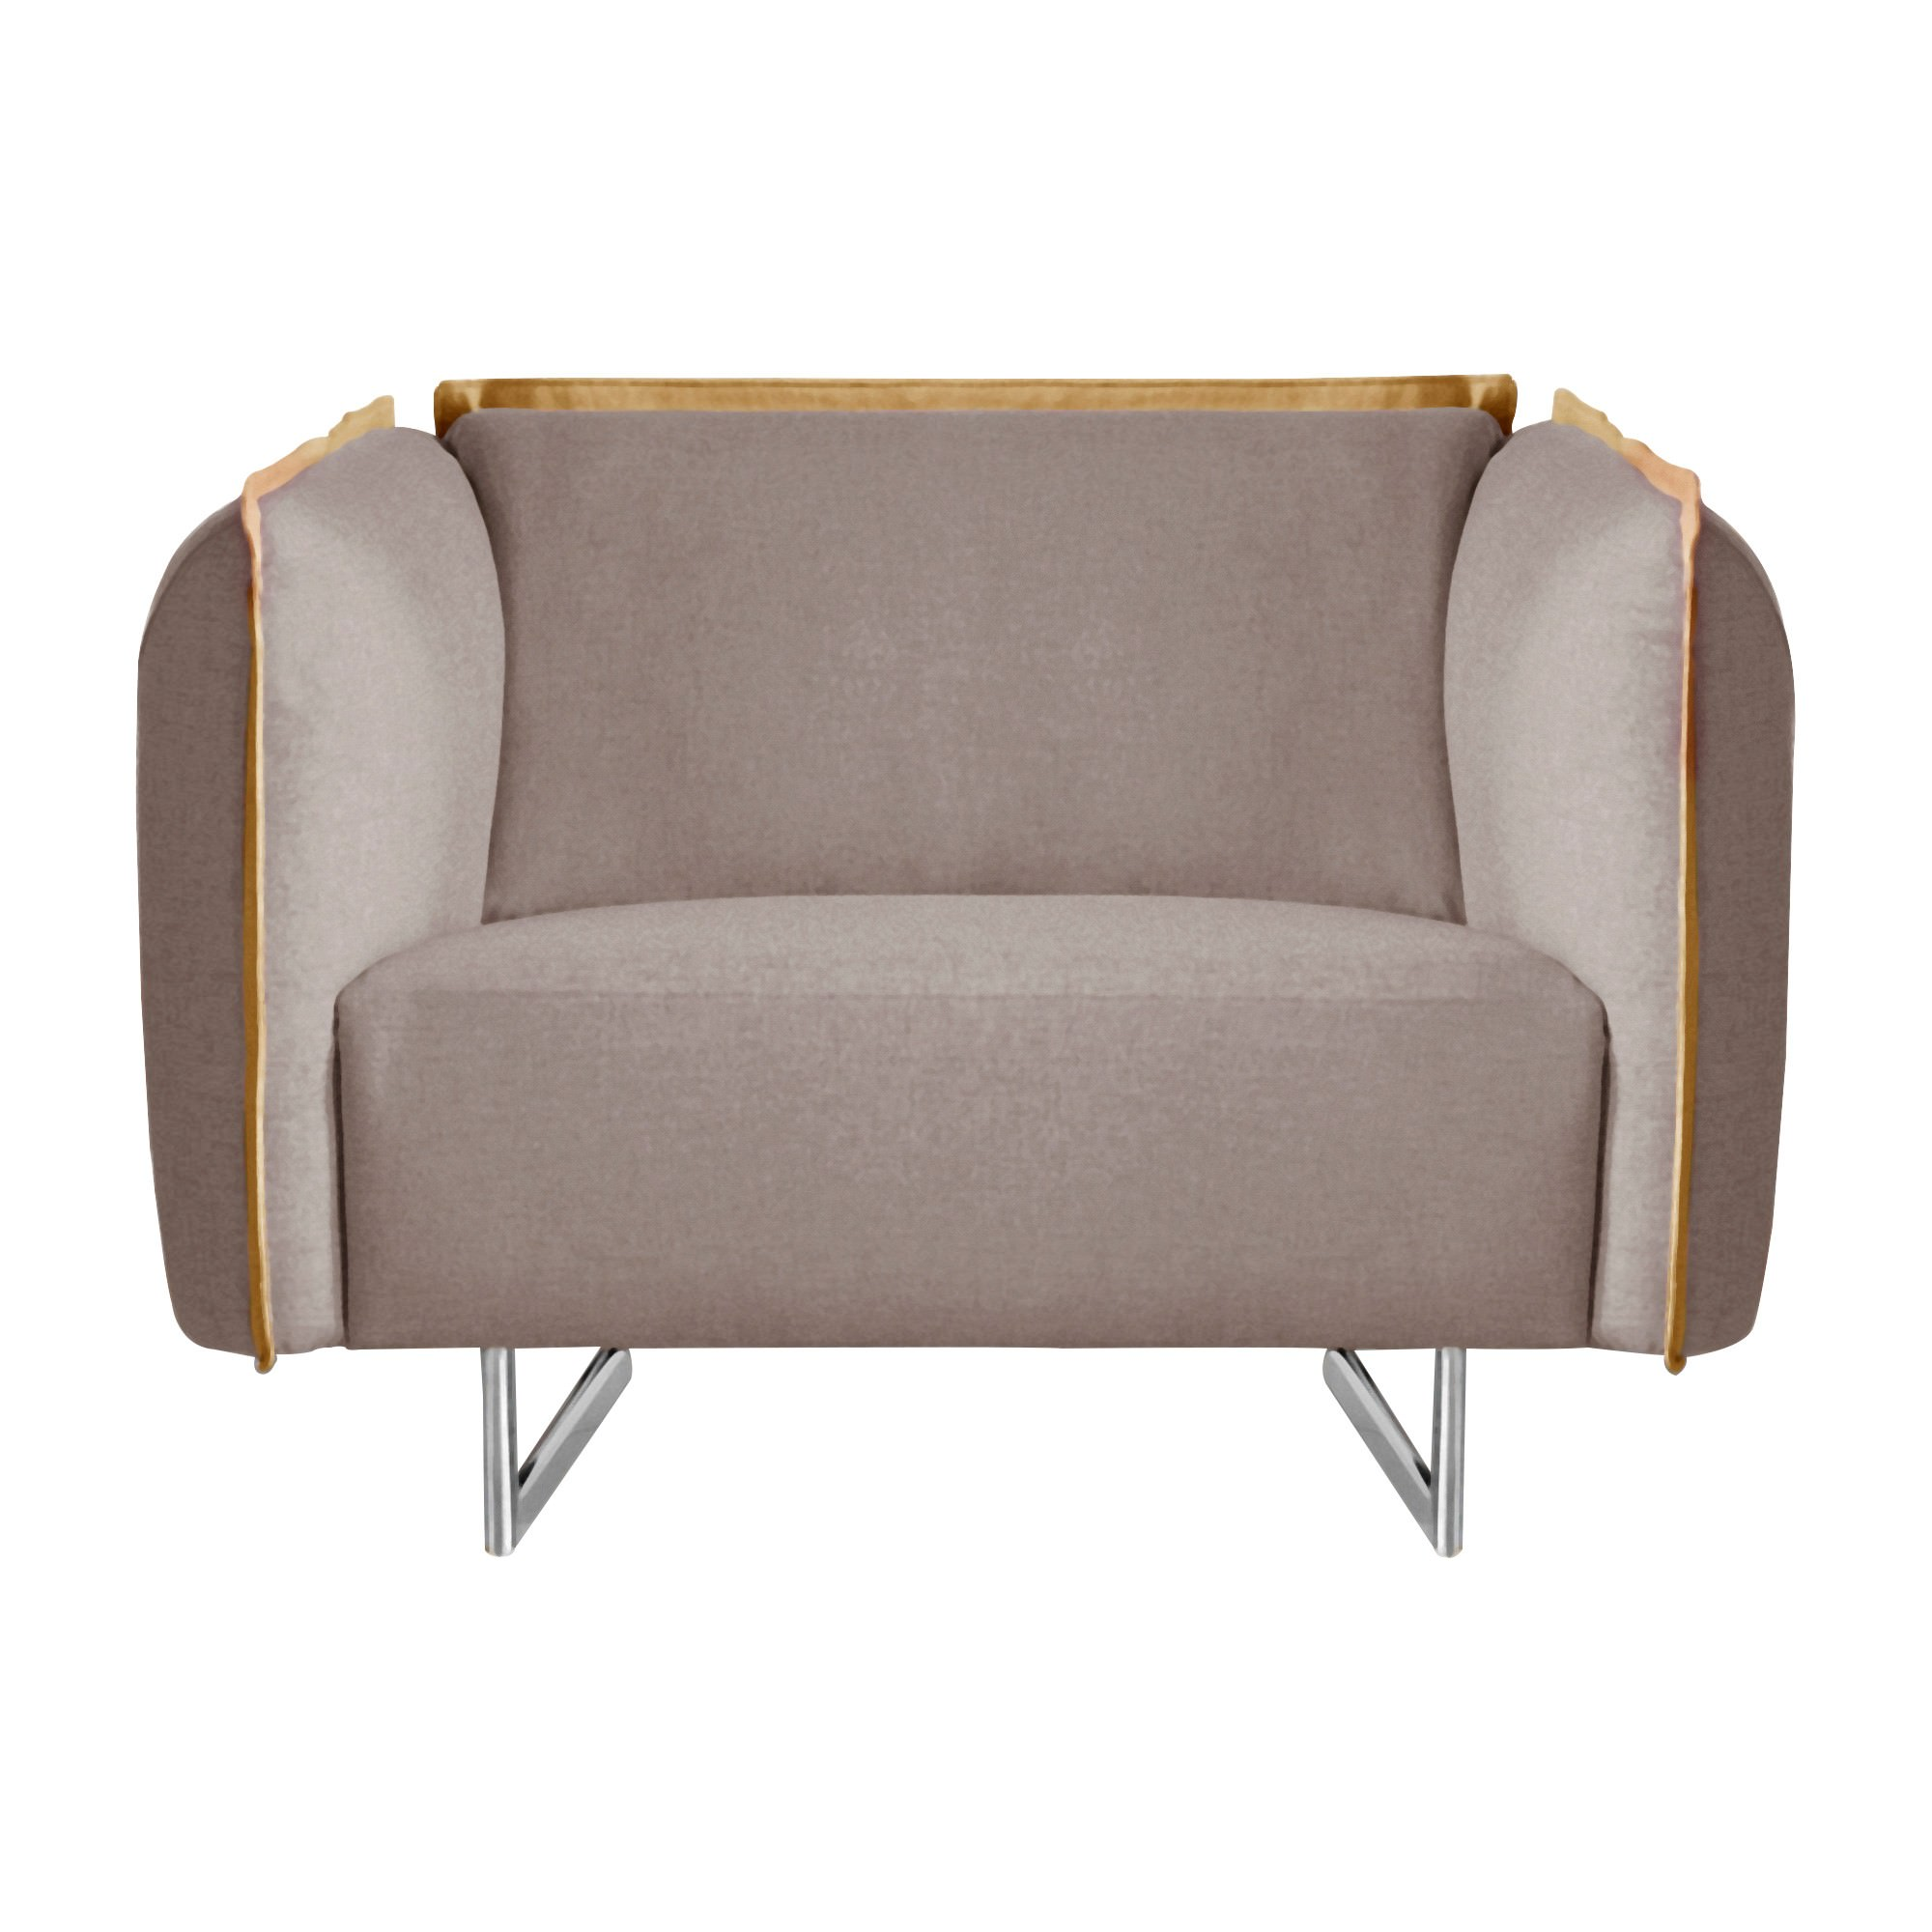 Peyton Fabric Armchair, Light Grey